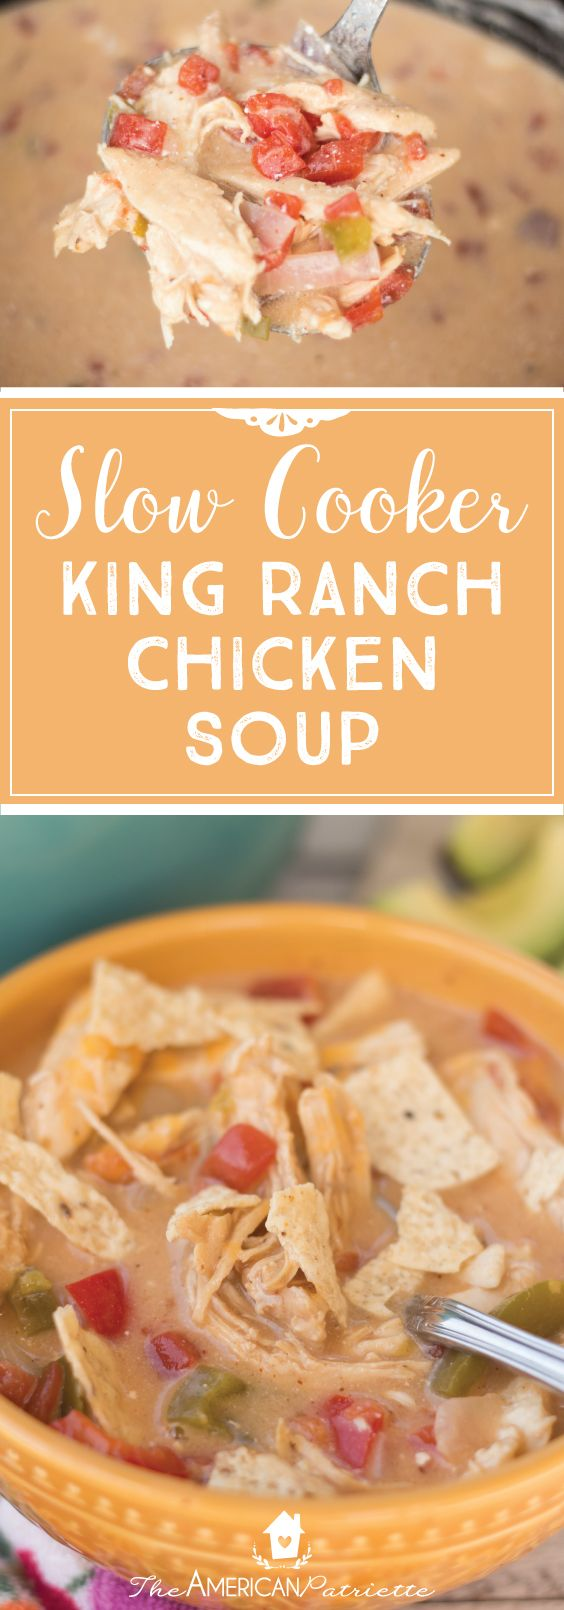 Slow Cooker King Ranch Chicken Soup; Crock Pot King Ranch Chicken Soup; Easy Slow Cooker Soup Recipes; Simple Crock Pot Recipes